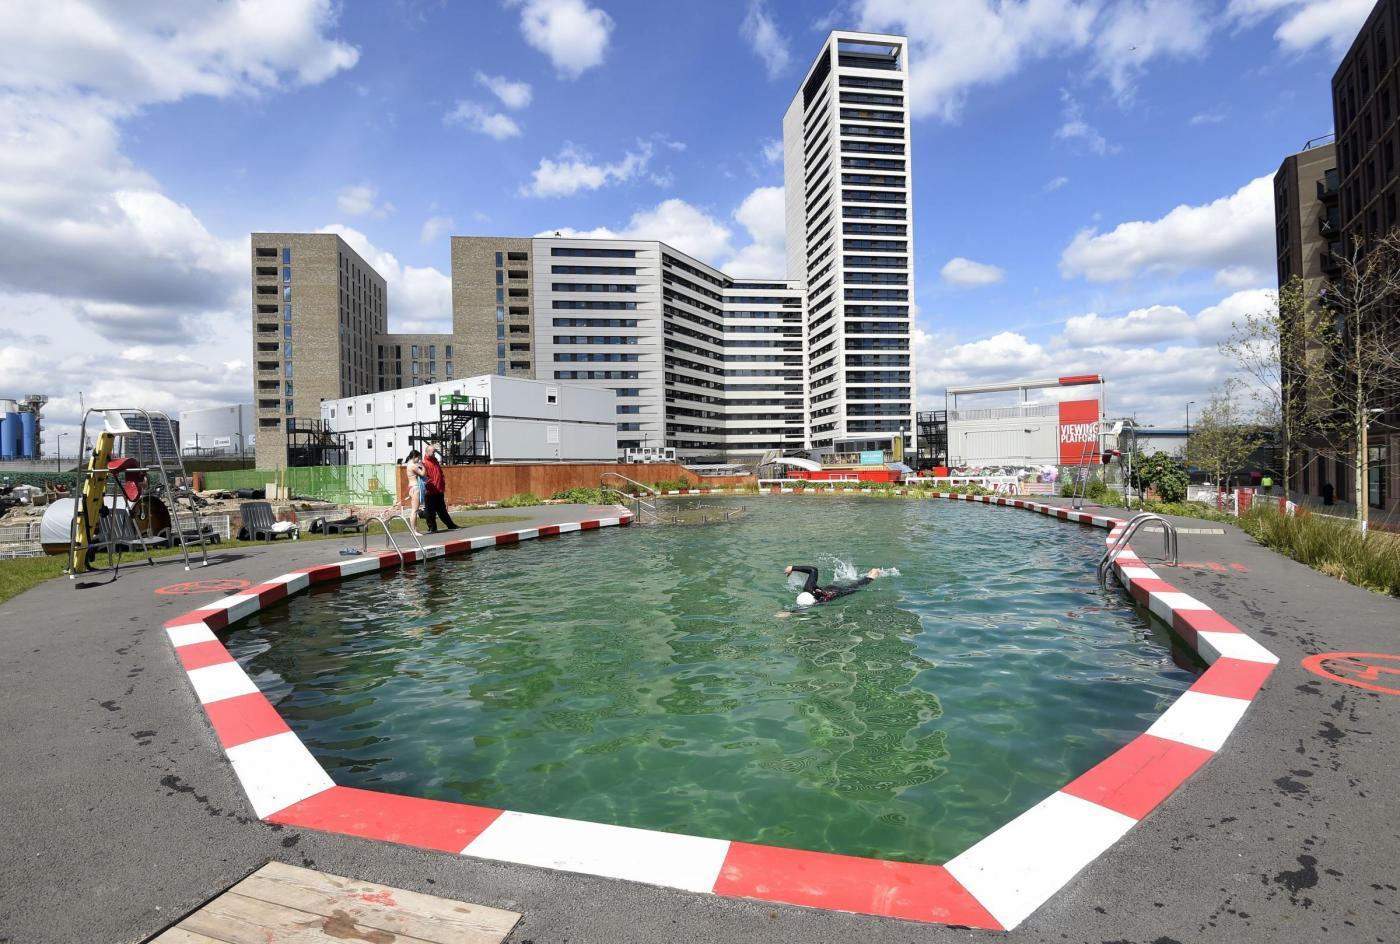 Londra a king 39 s cross una piscina naturale filtrata dalle - Piscina naturale ...